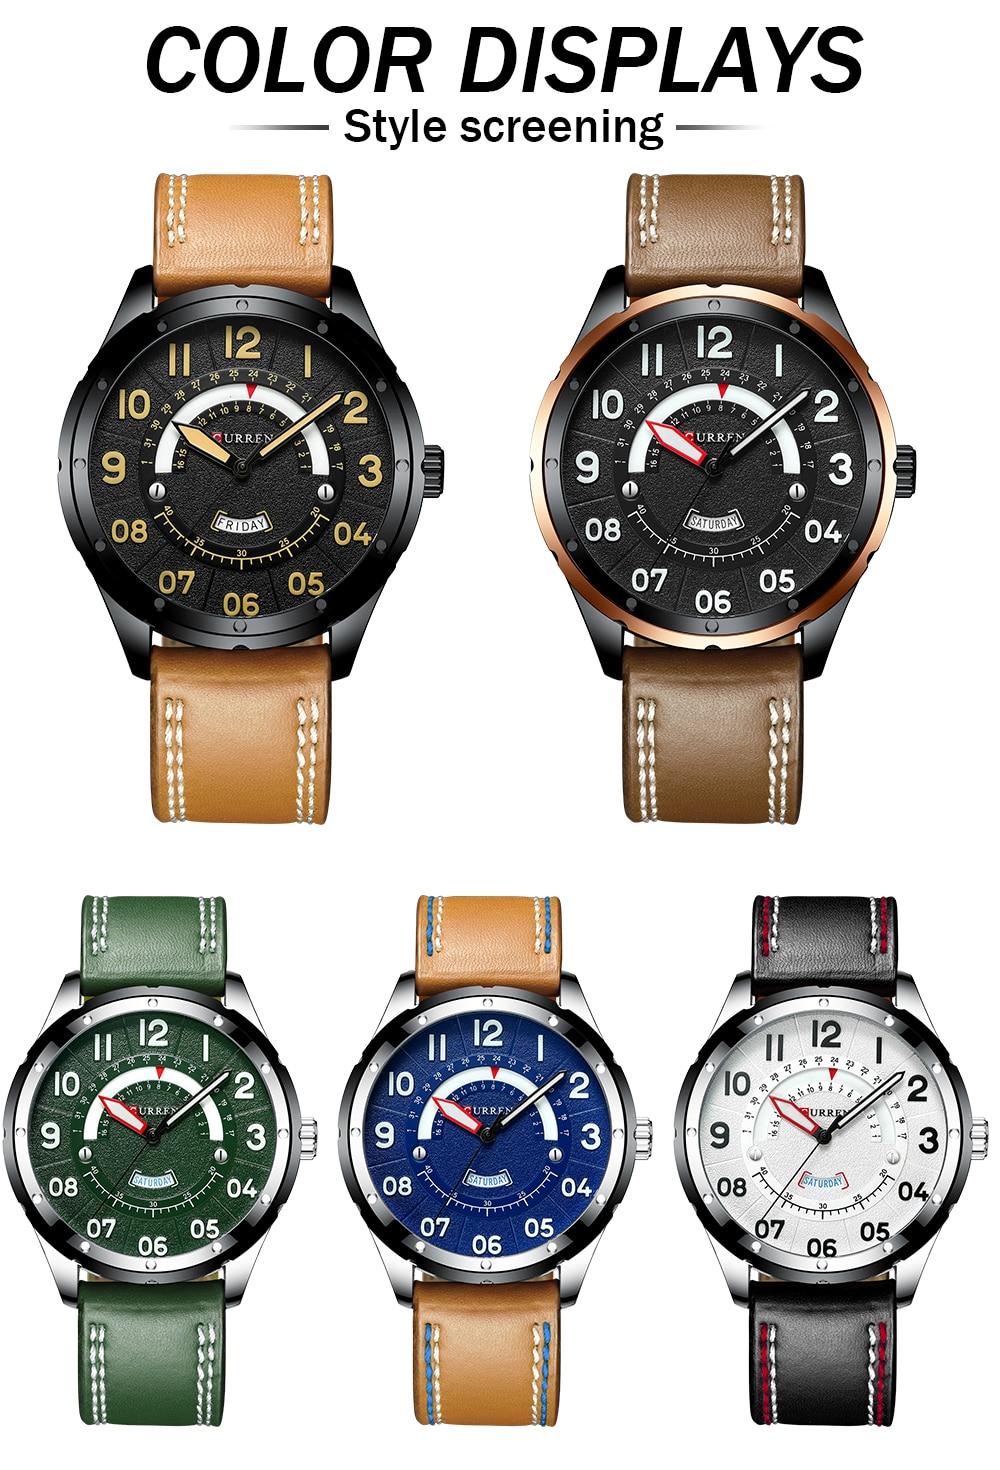 HTB1bRBsaAH0gK0jSZPiq6yvapXas CURREN Date Mens Watches Luxury Sport Watch